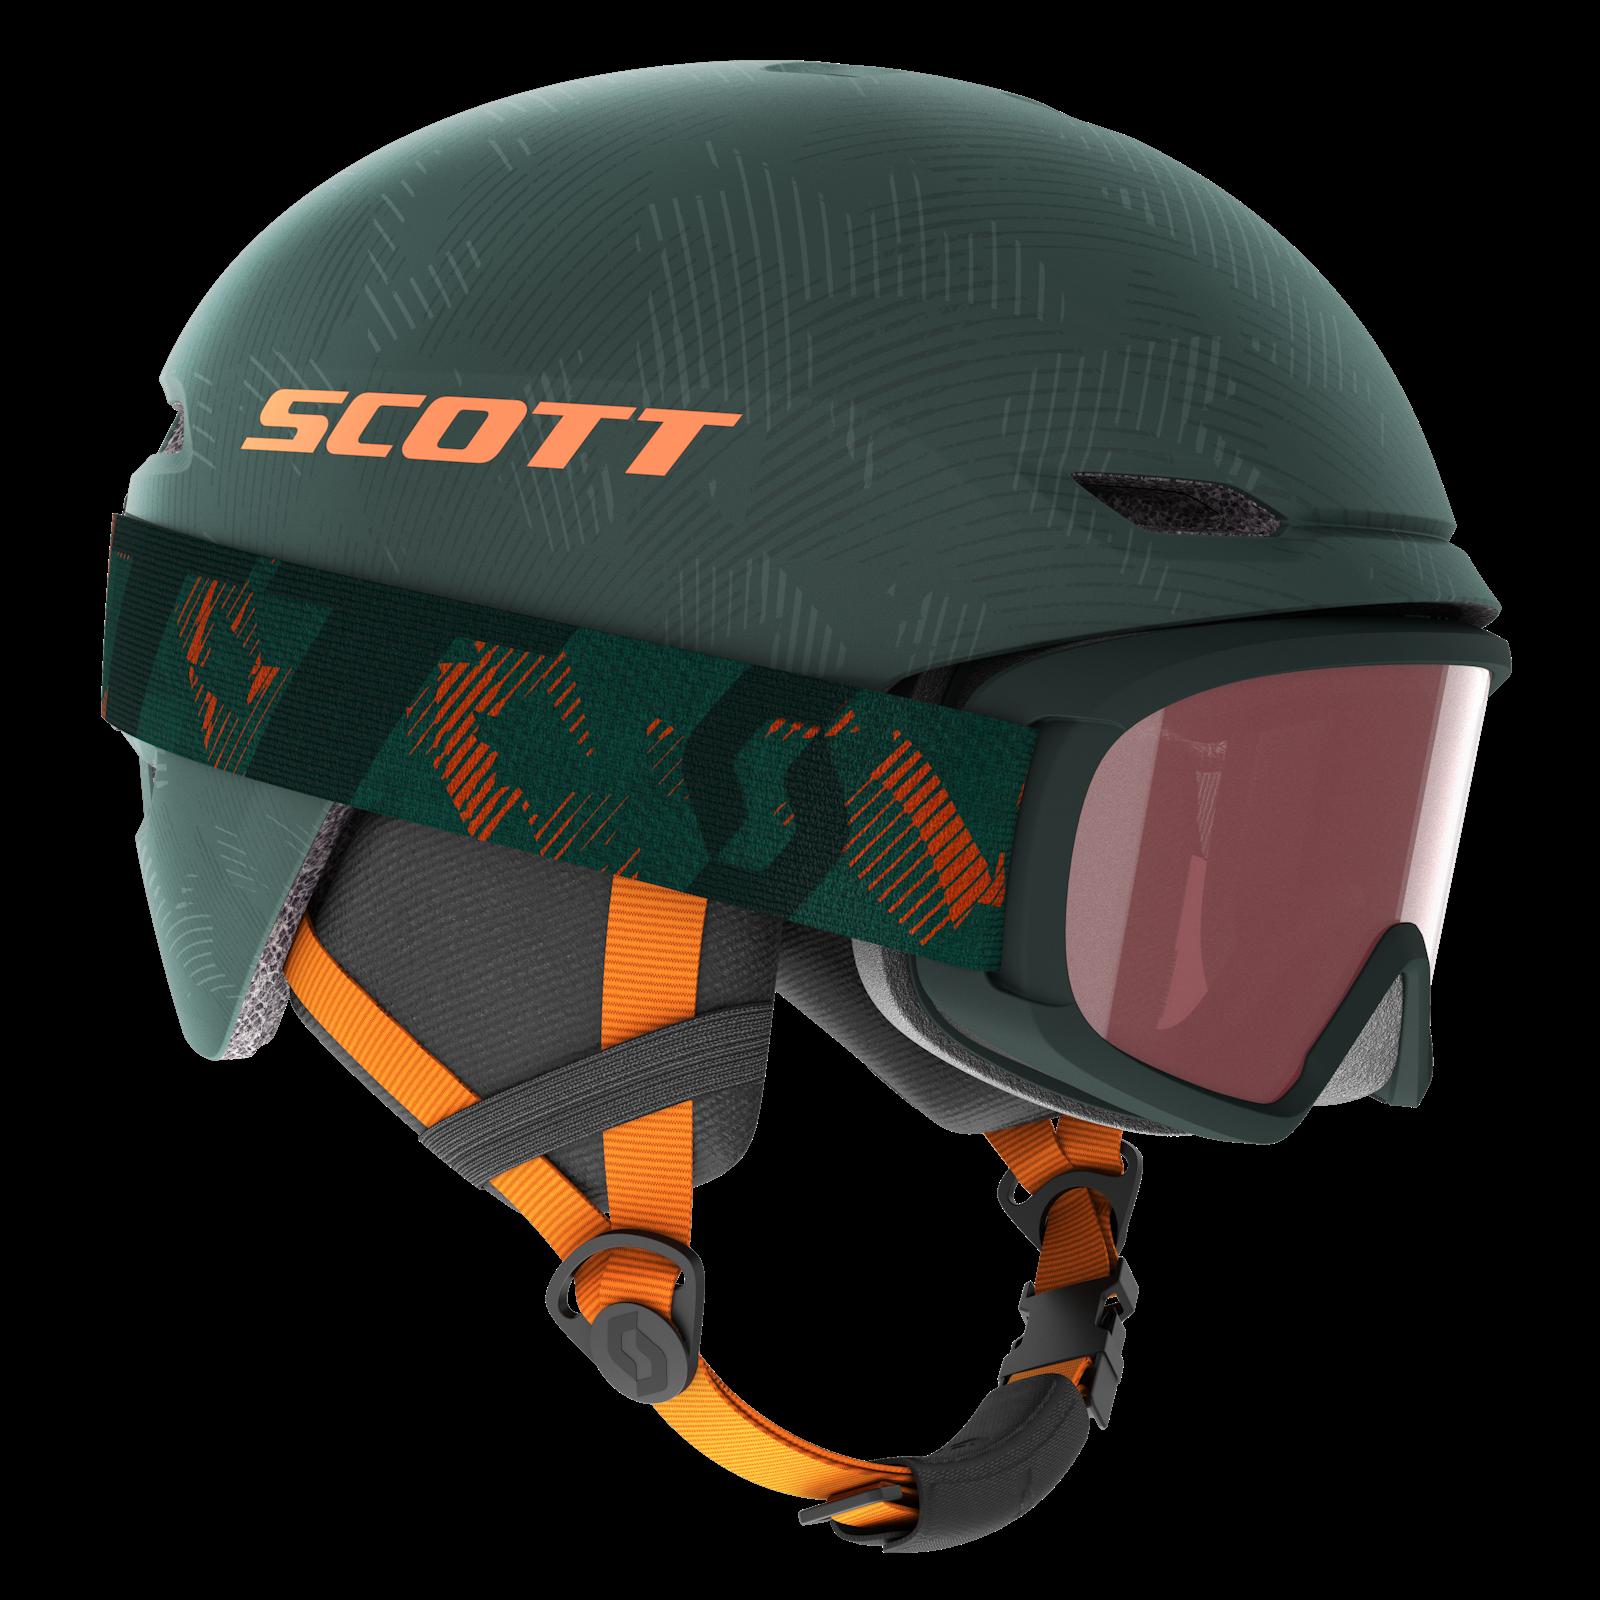 SCOTT Helmet Keeper 2 + Goggle Witty